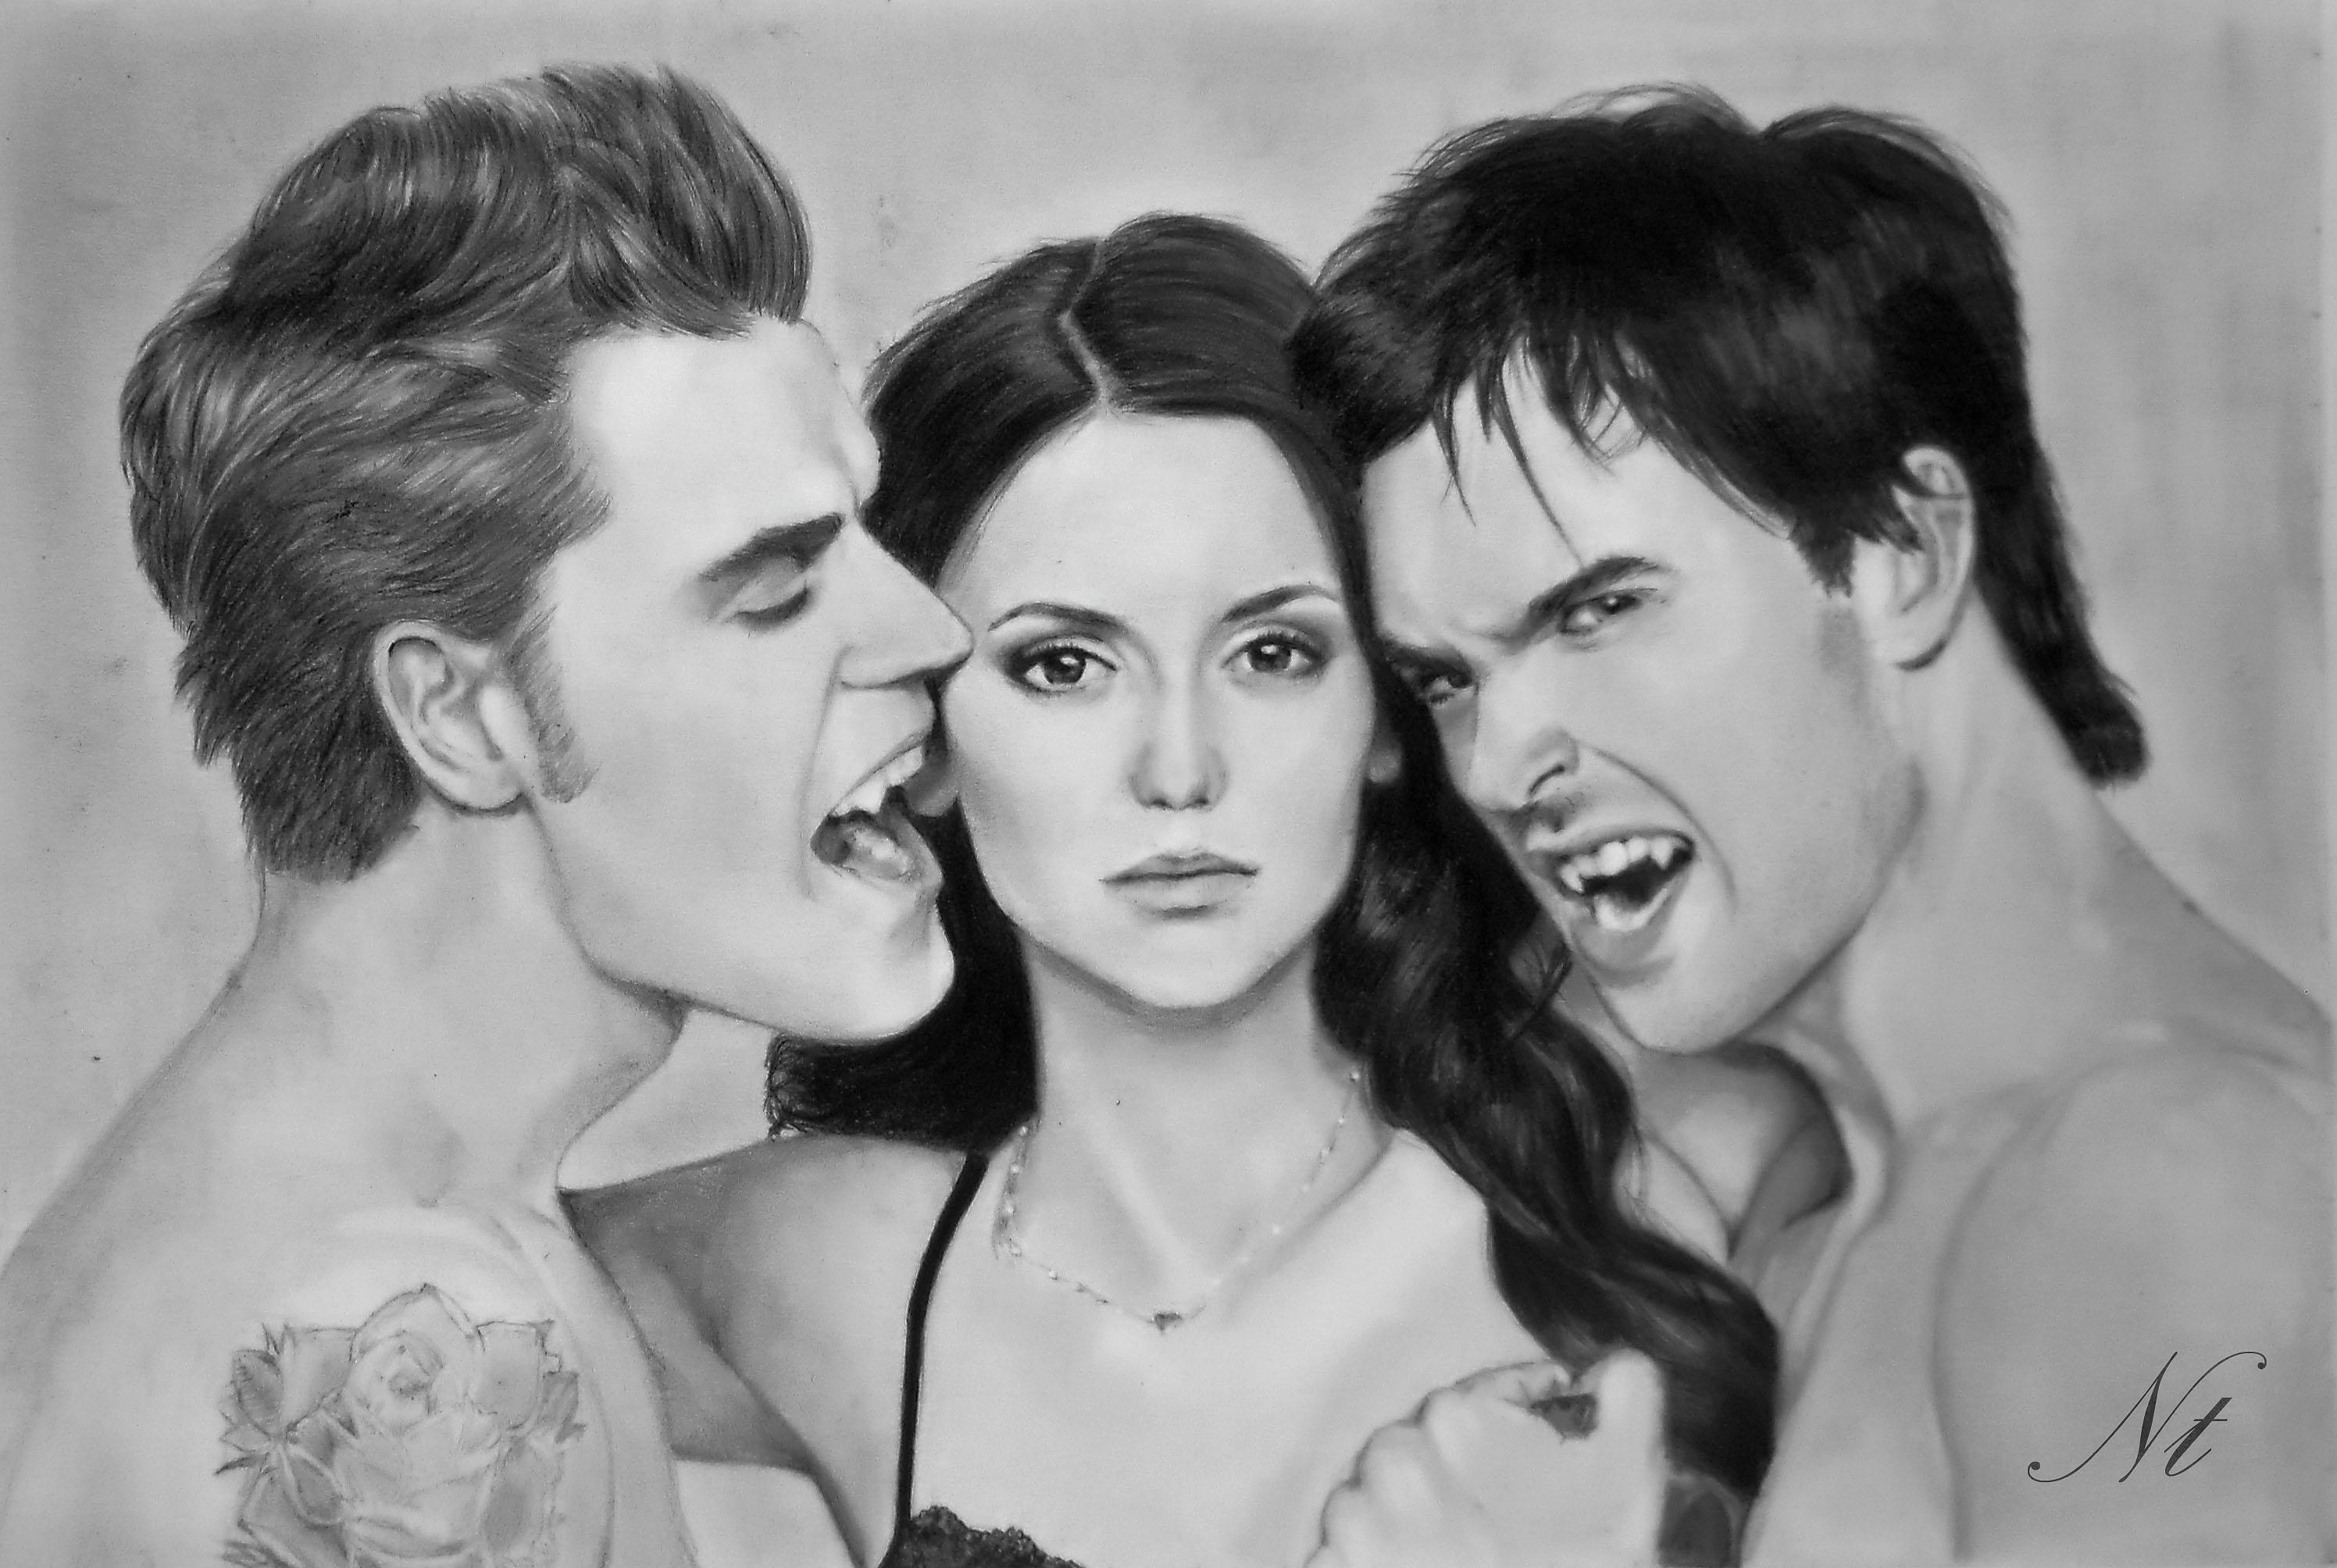 Drawn vampire art Natlina by on Vampire Natlina